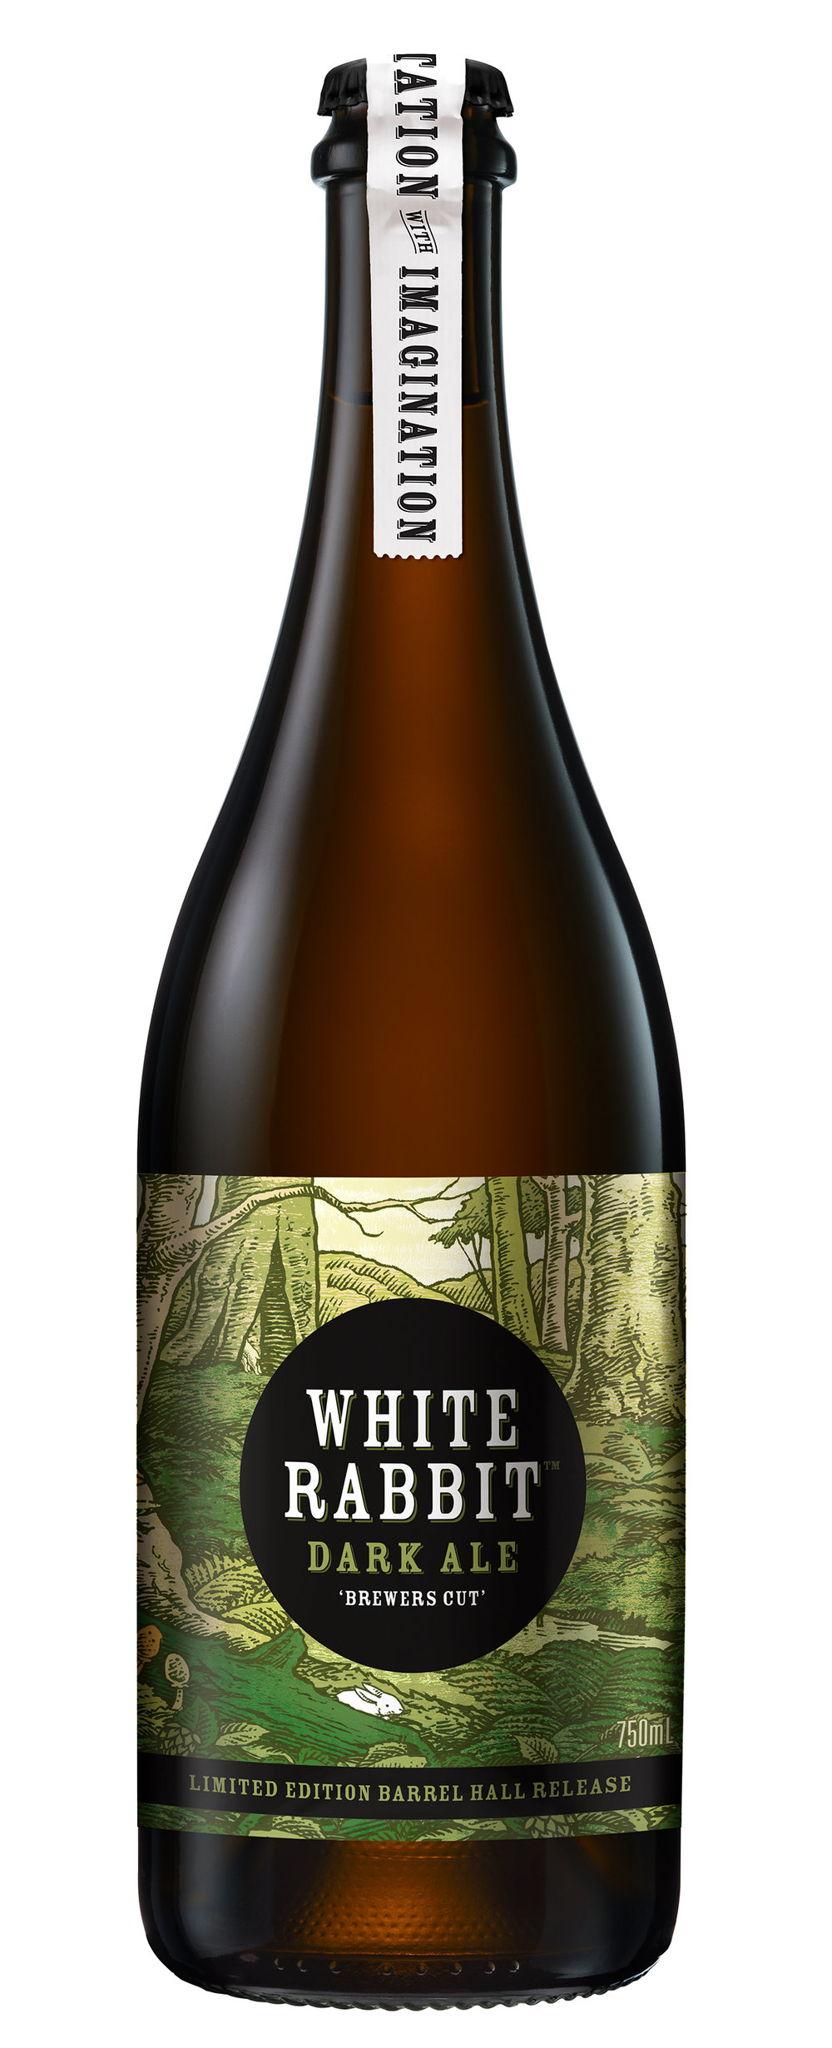 Energi_Design_White_Rabbit_DA_Brewers_Cut_750mL_Bottle.jpg